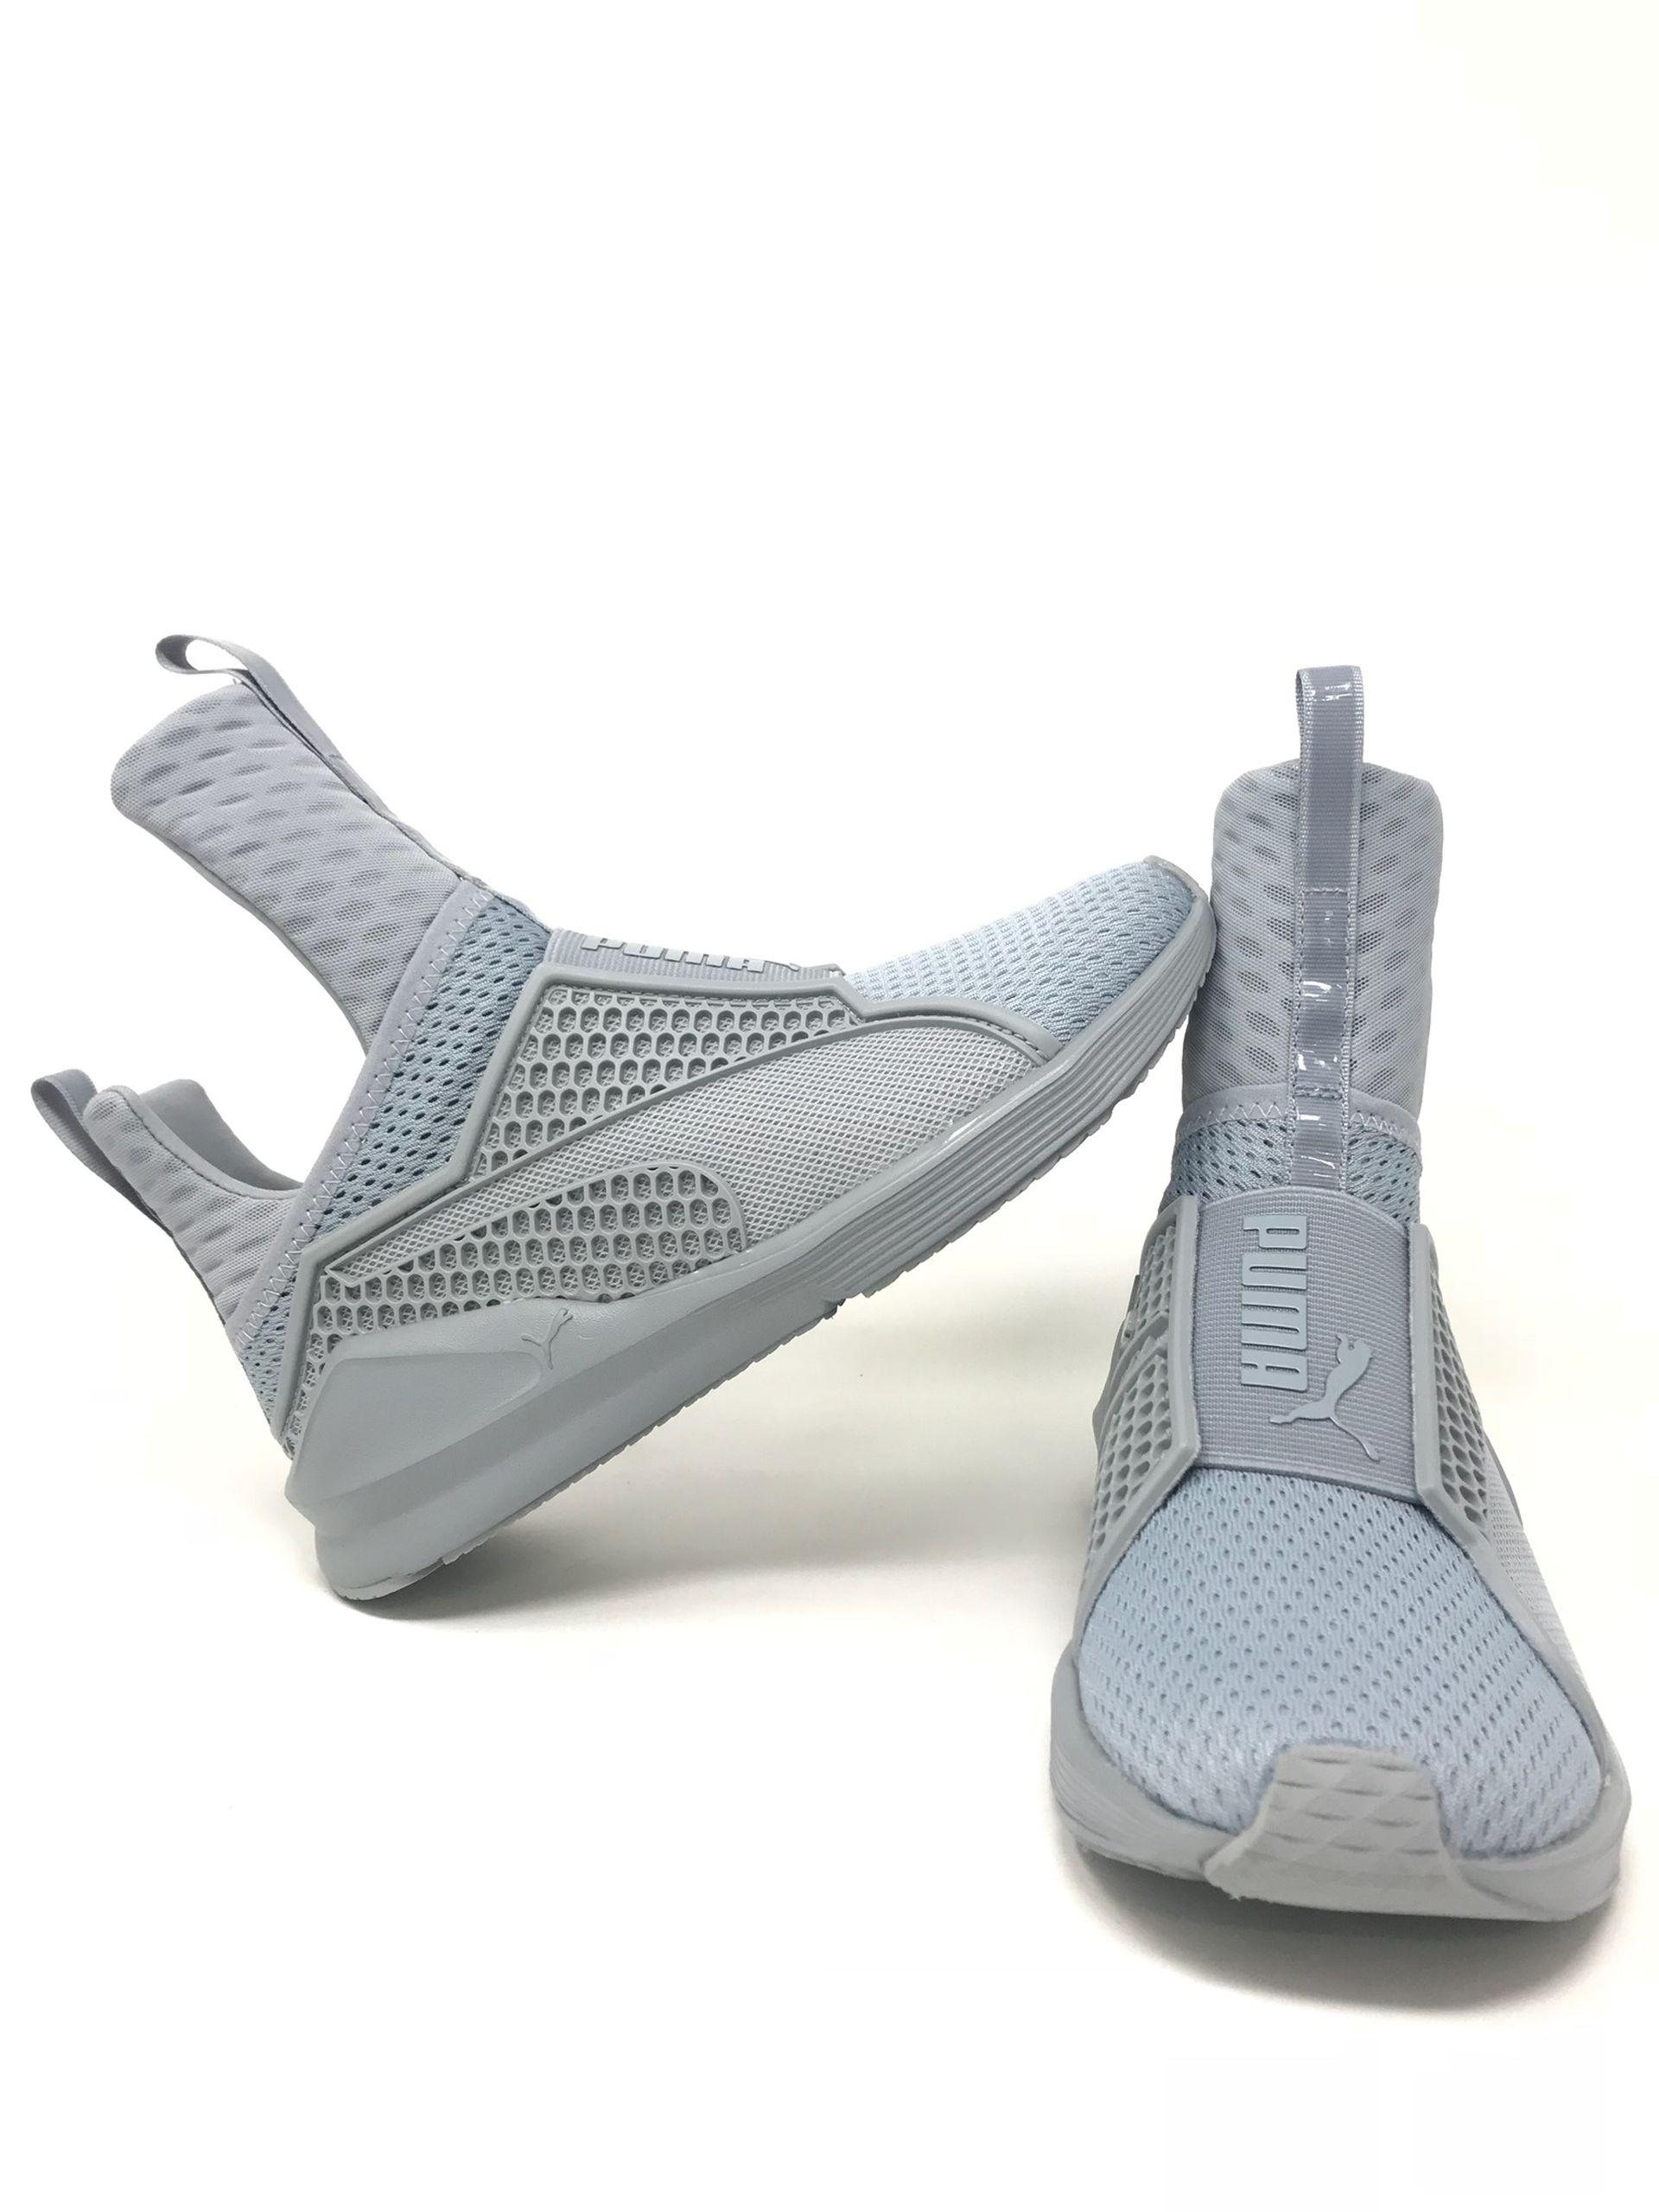 PUMA Women's Fenty Trainer Quarry Athletic Shoe